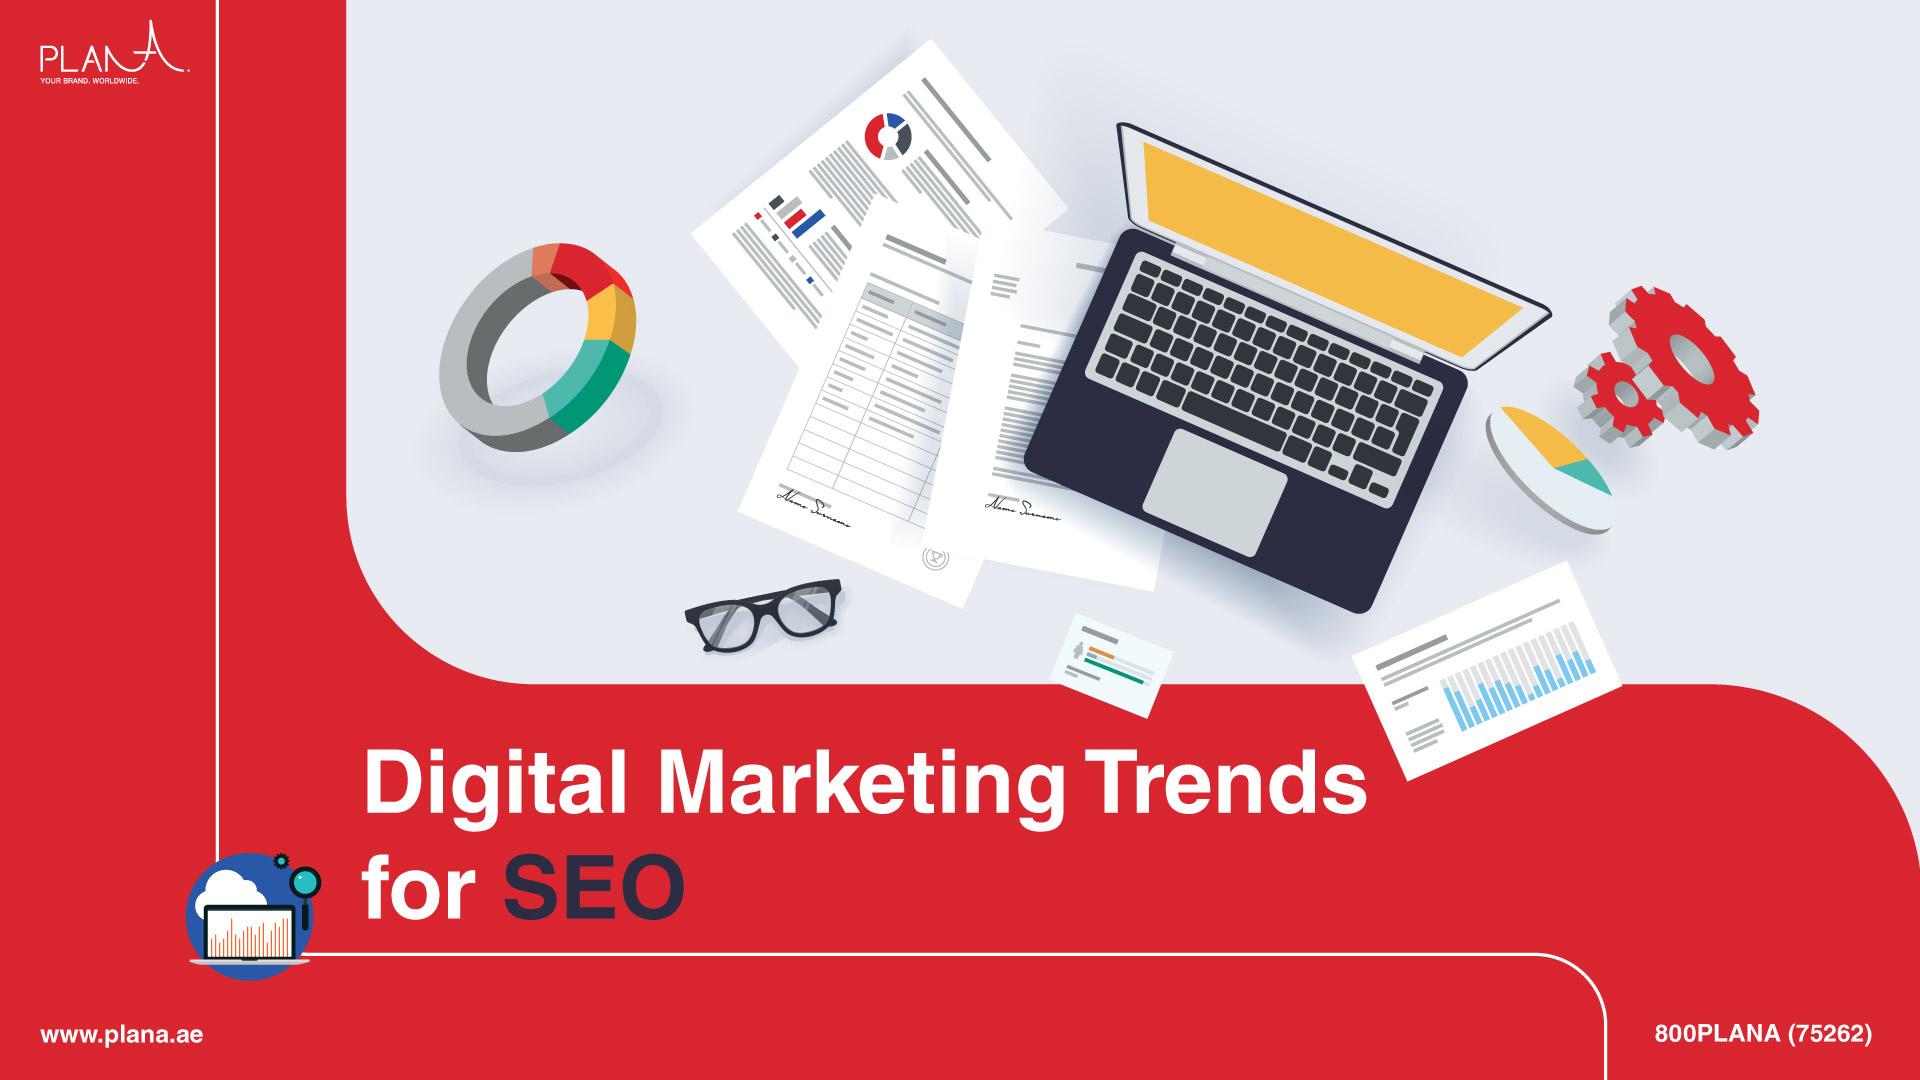 Digital Marketing Trends for SEO